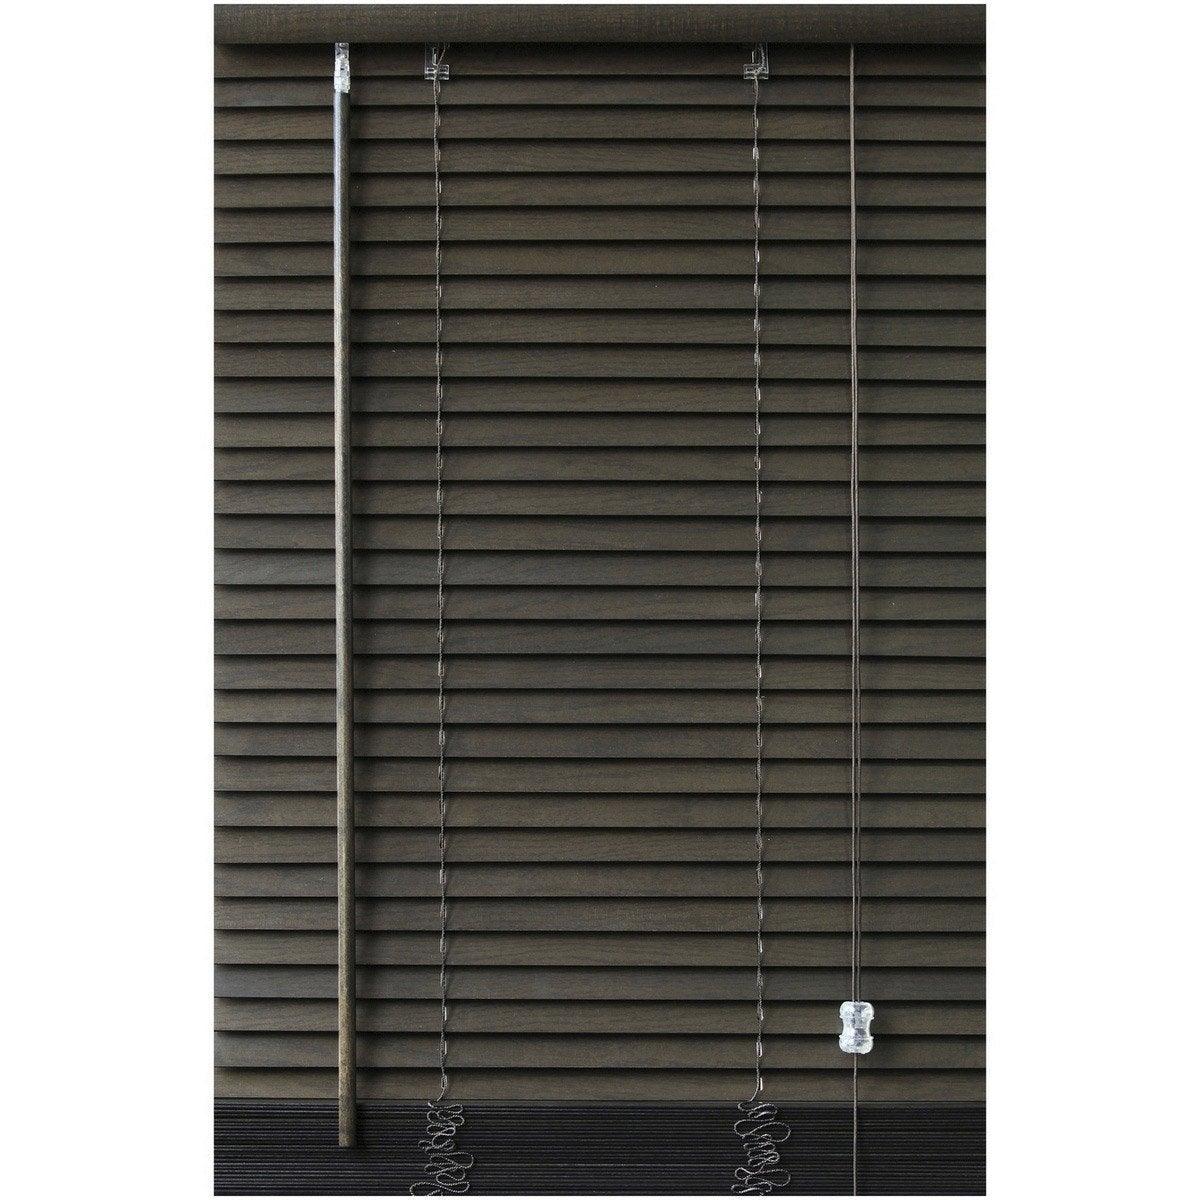 Store v nitien bois weng x cm leroy merlin for Store interieur bois